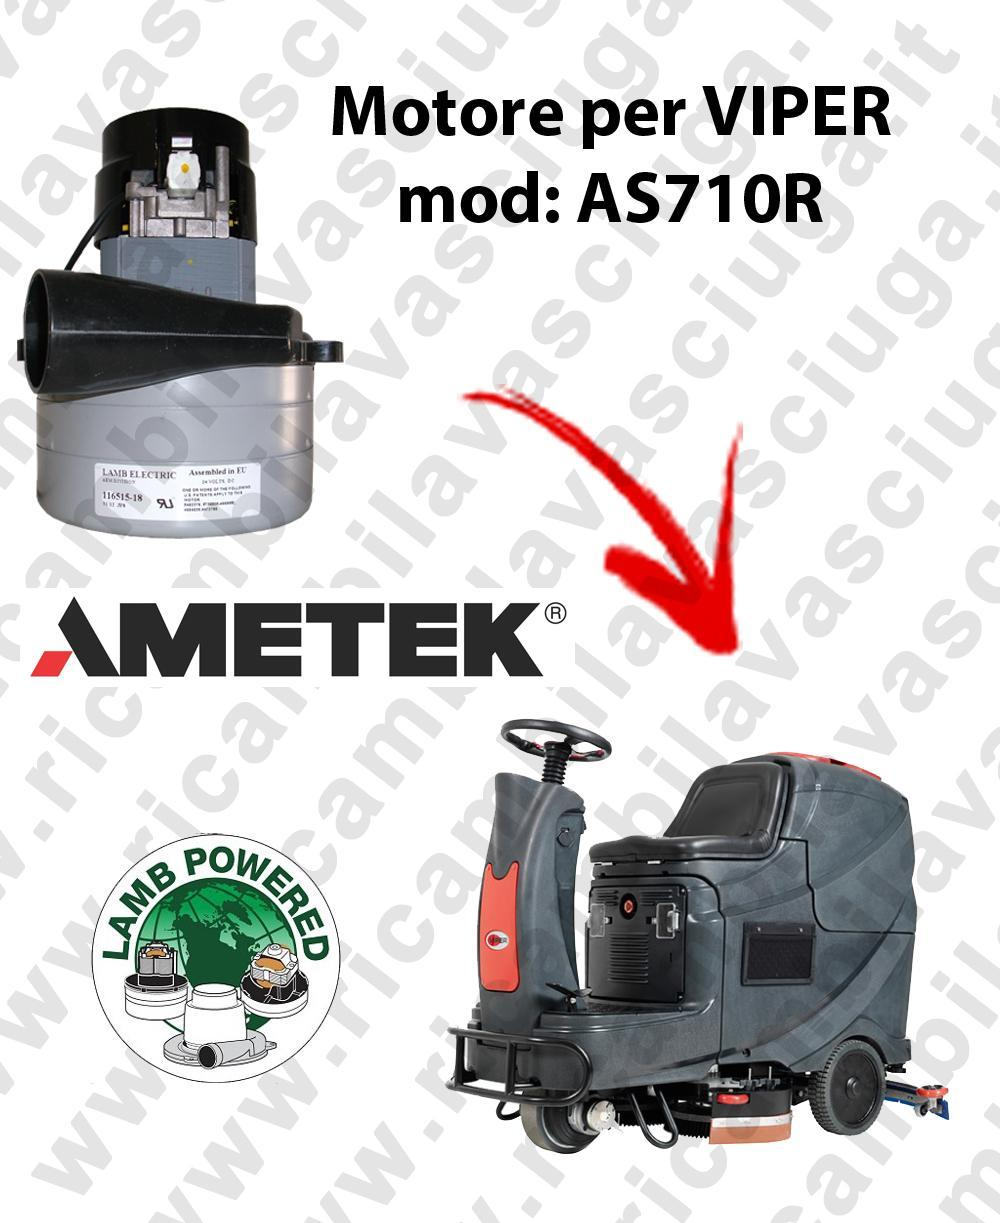 AS710R Saugmotor LAMB AMETEK für scheuersaugmaschinen VIPER